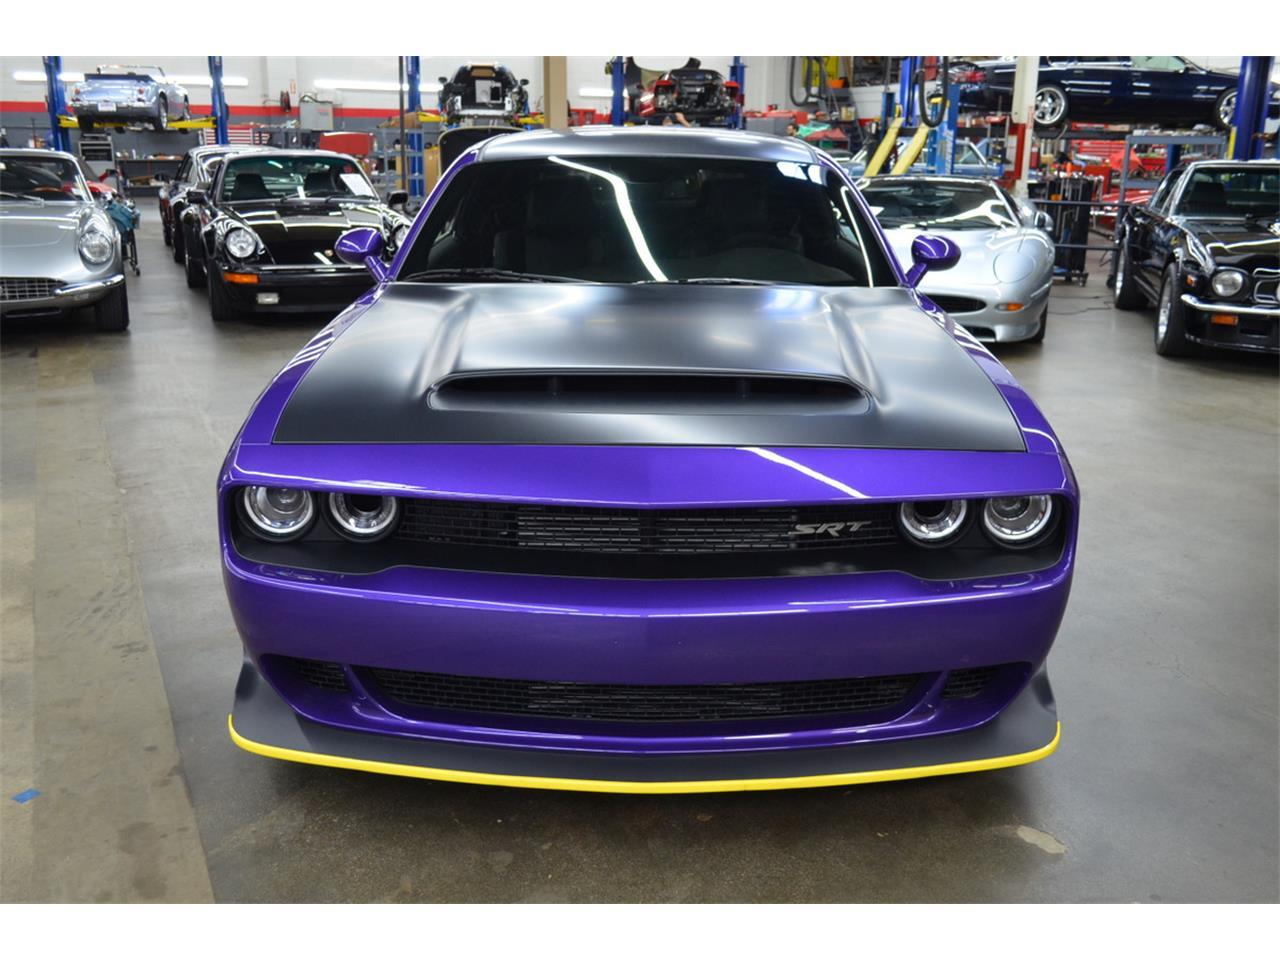 2018 Dodge Challenger Demon (CC-1247846) for sale in Huntington Station, New York